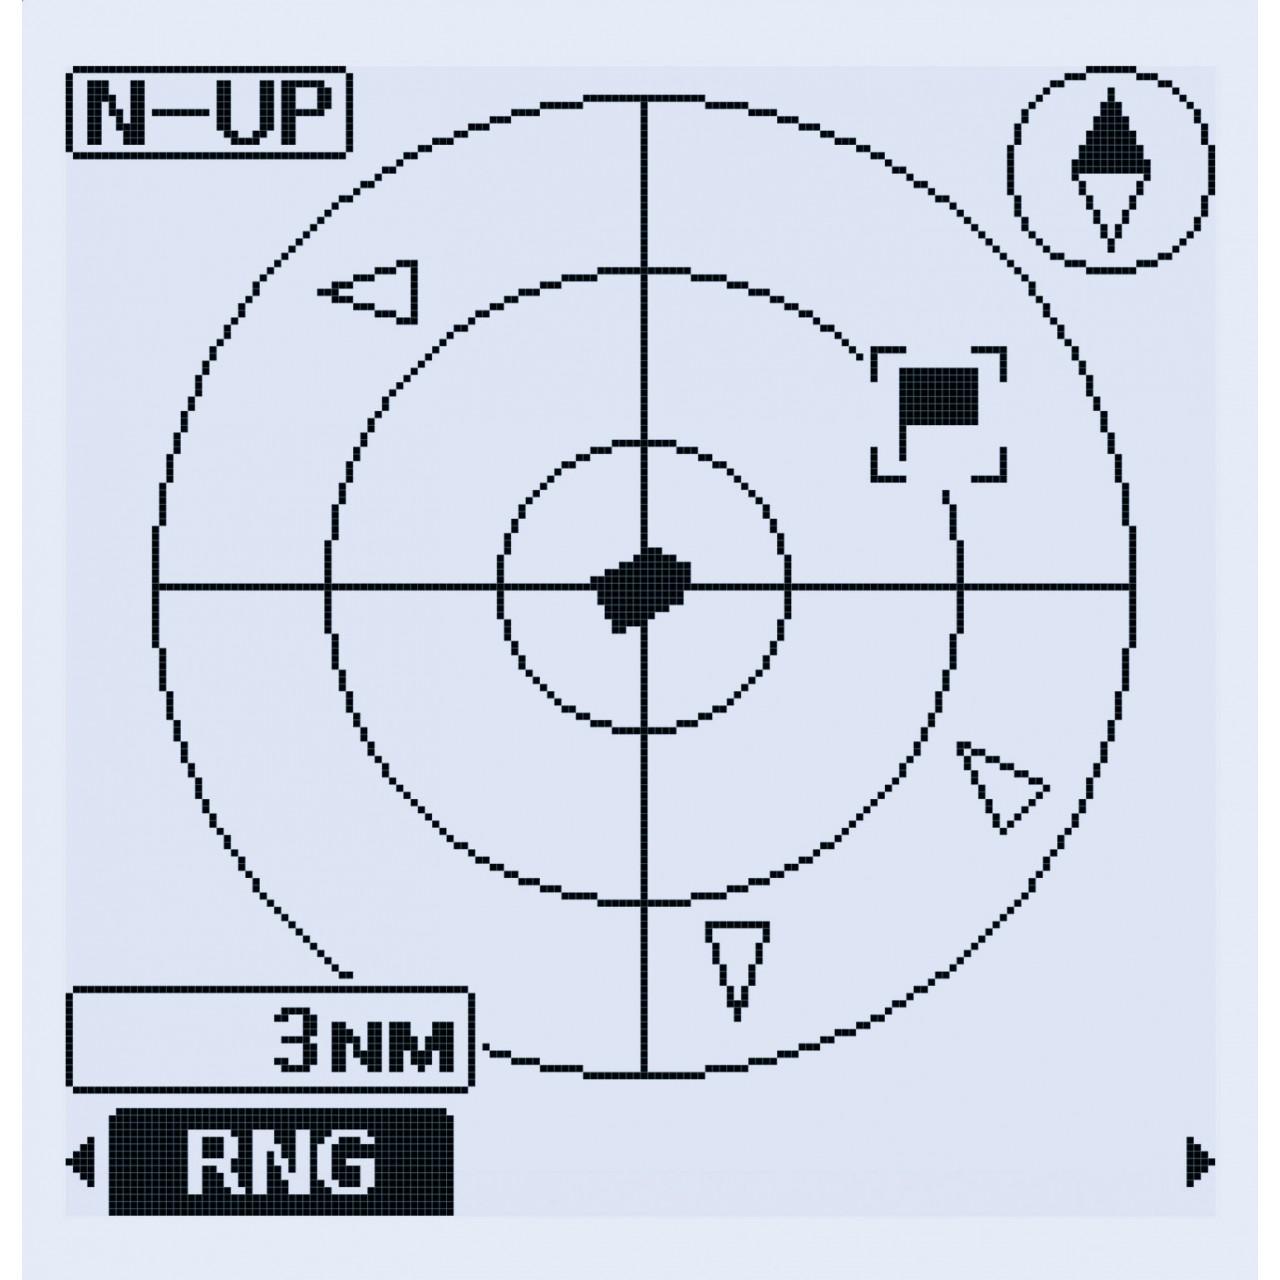 VHF marine IC-M94DE. NAVIGATION